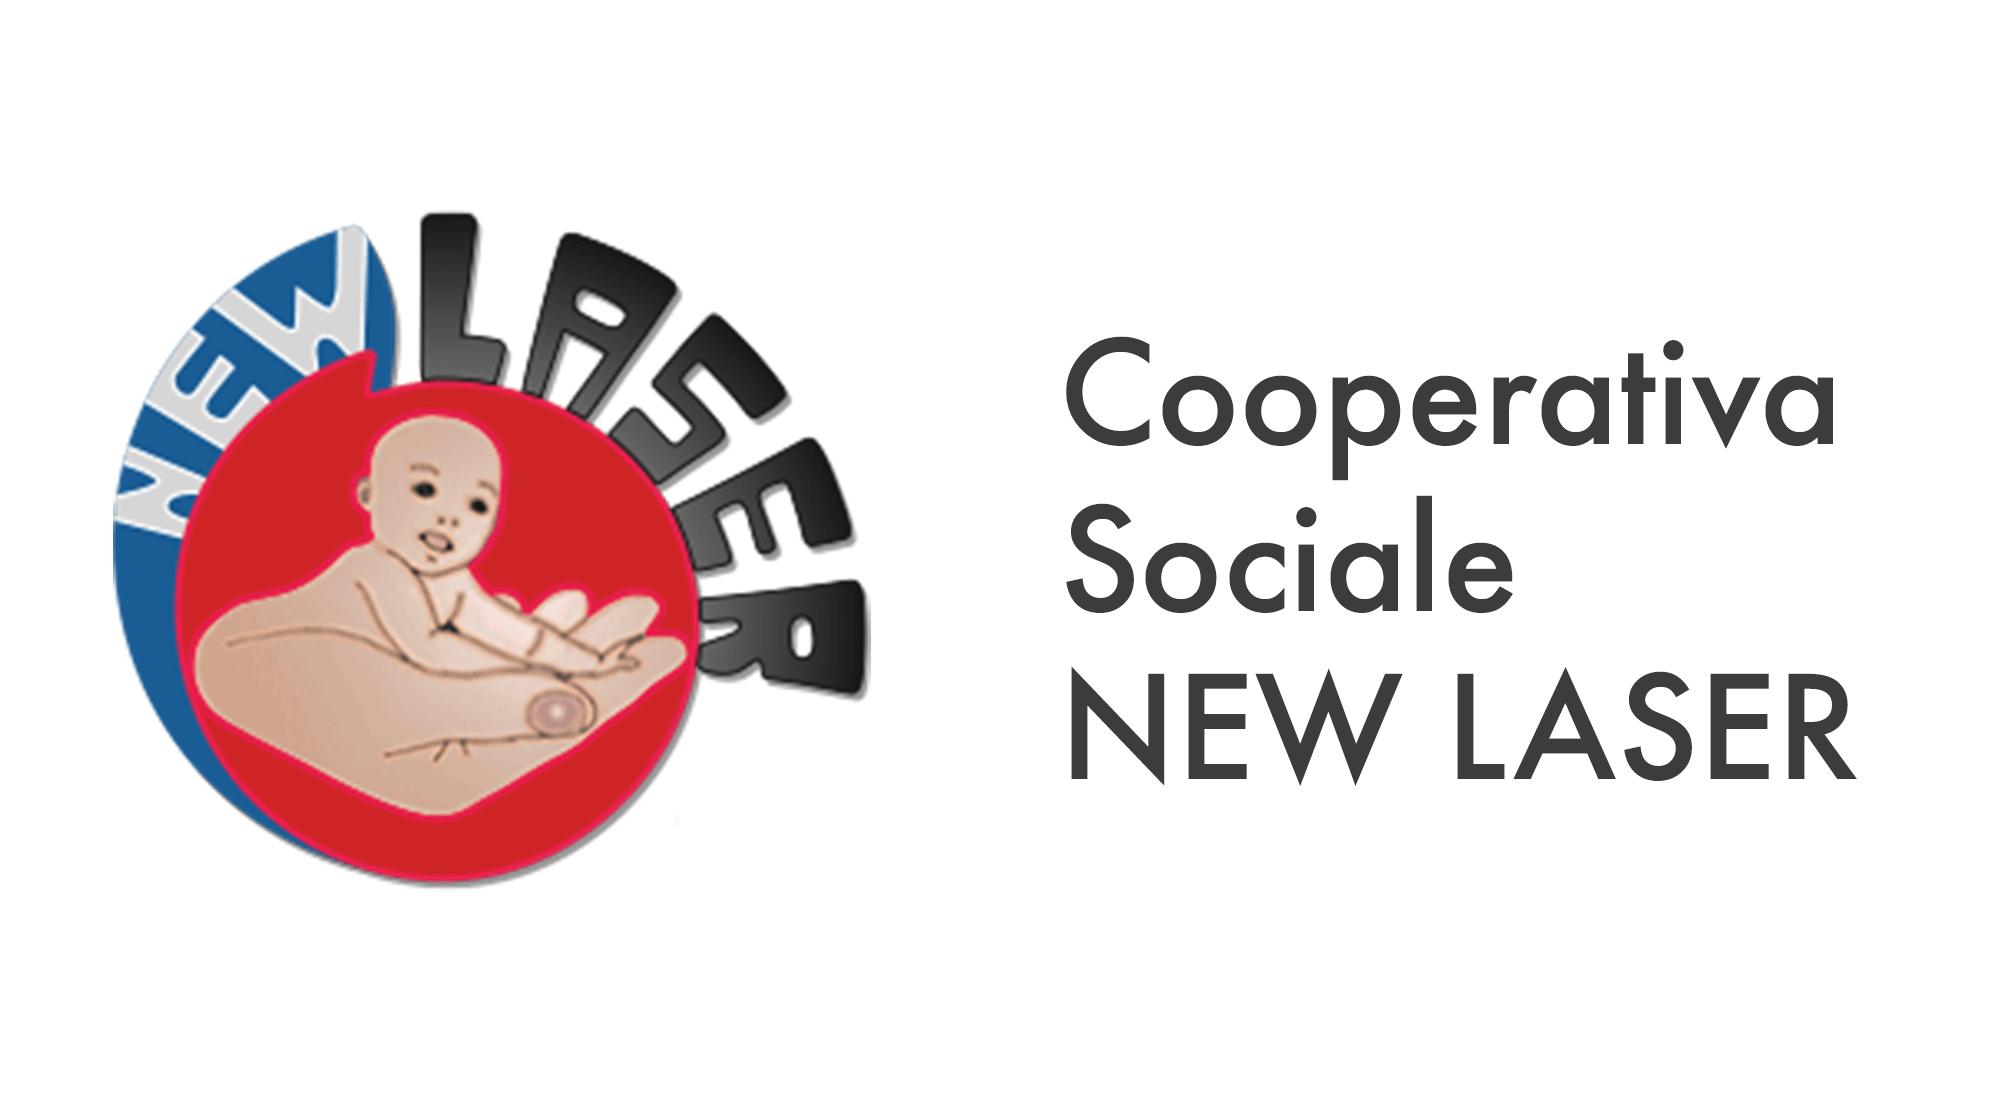 Cooperativa Sociale New Laser